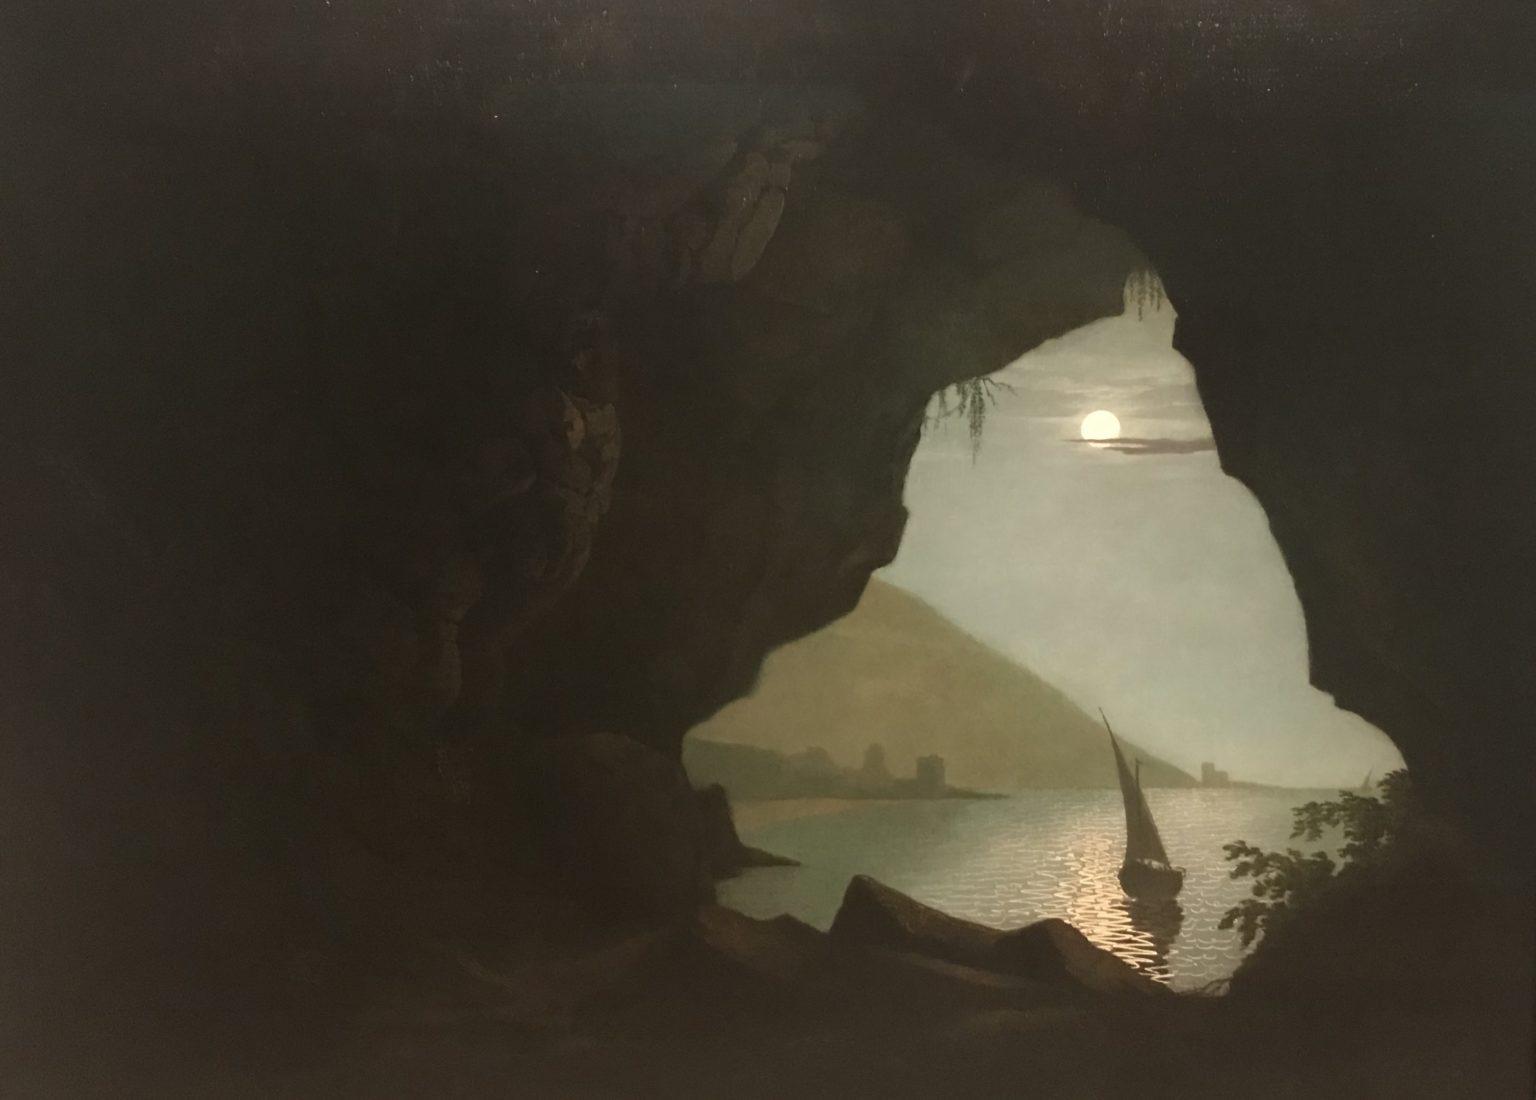 Joseph Wright of Derby grotte dans le golfe de Salerna